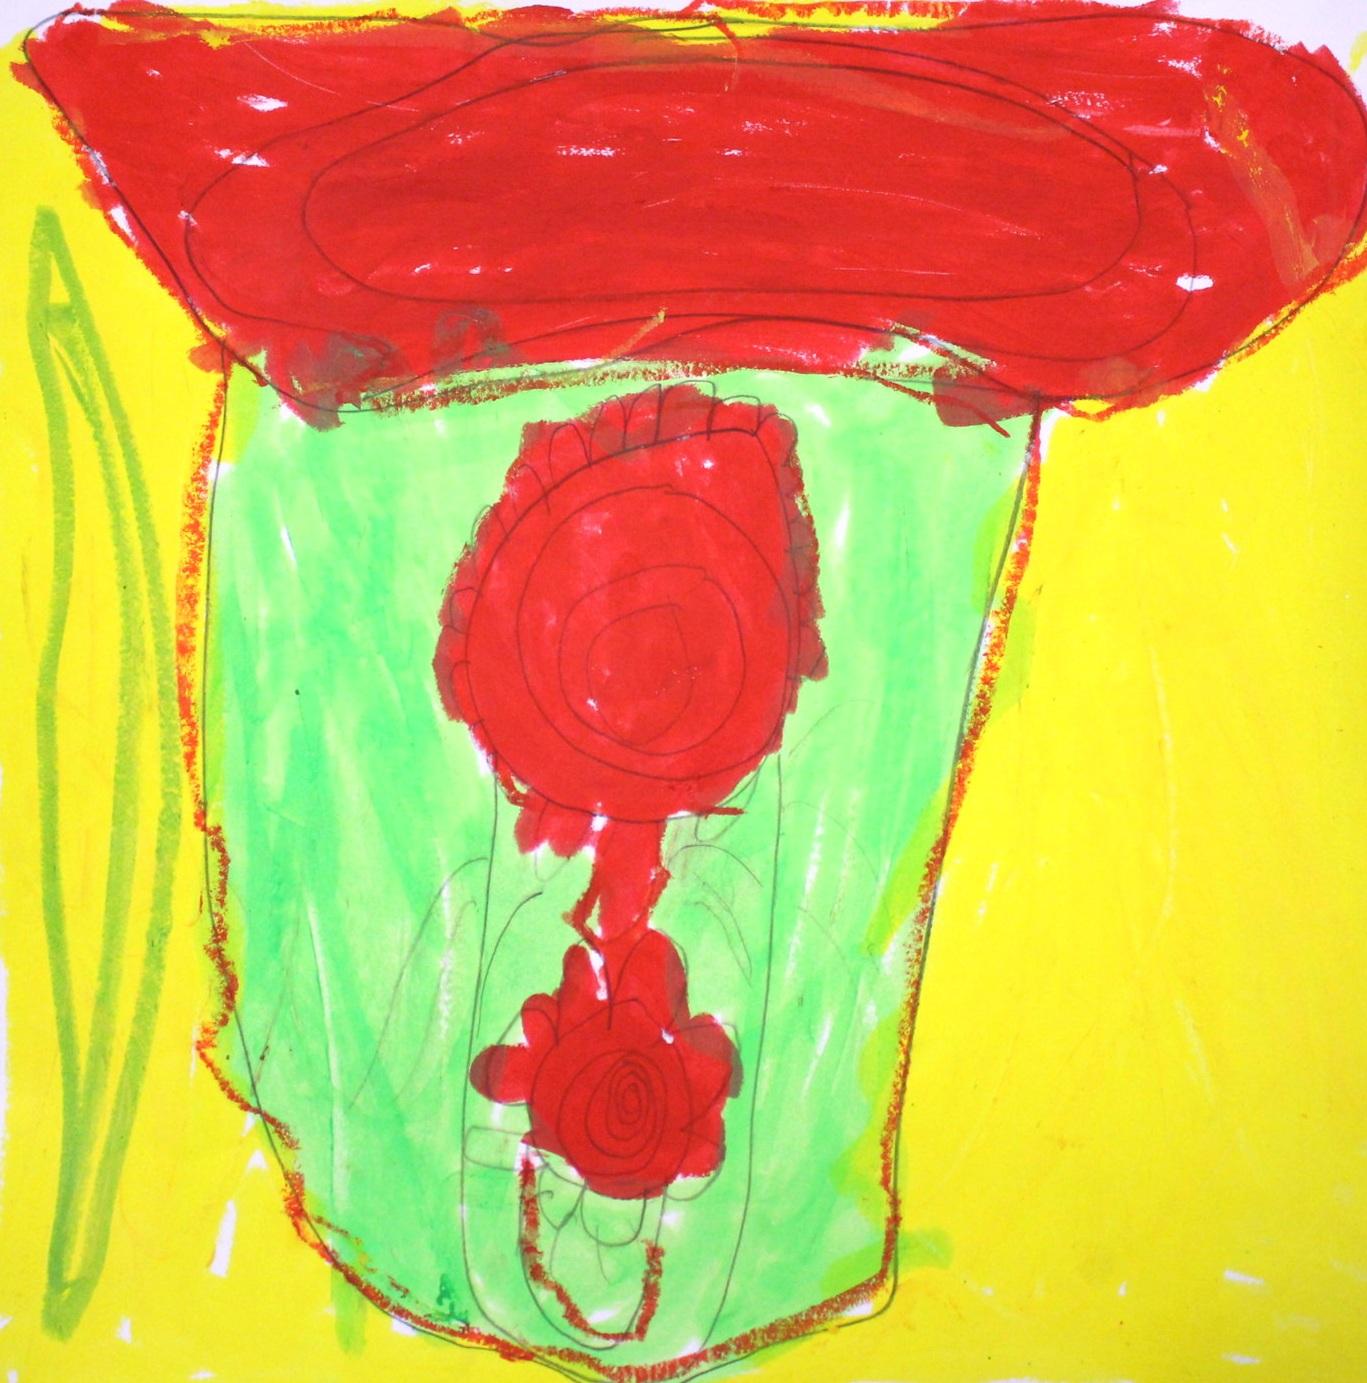 Grade 1: William A. - Georgia O'Keeffe Inspired Flowers